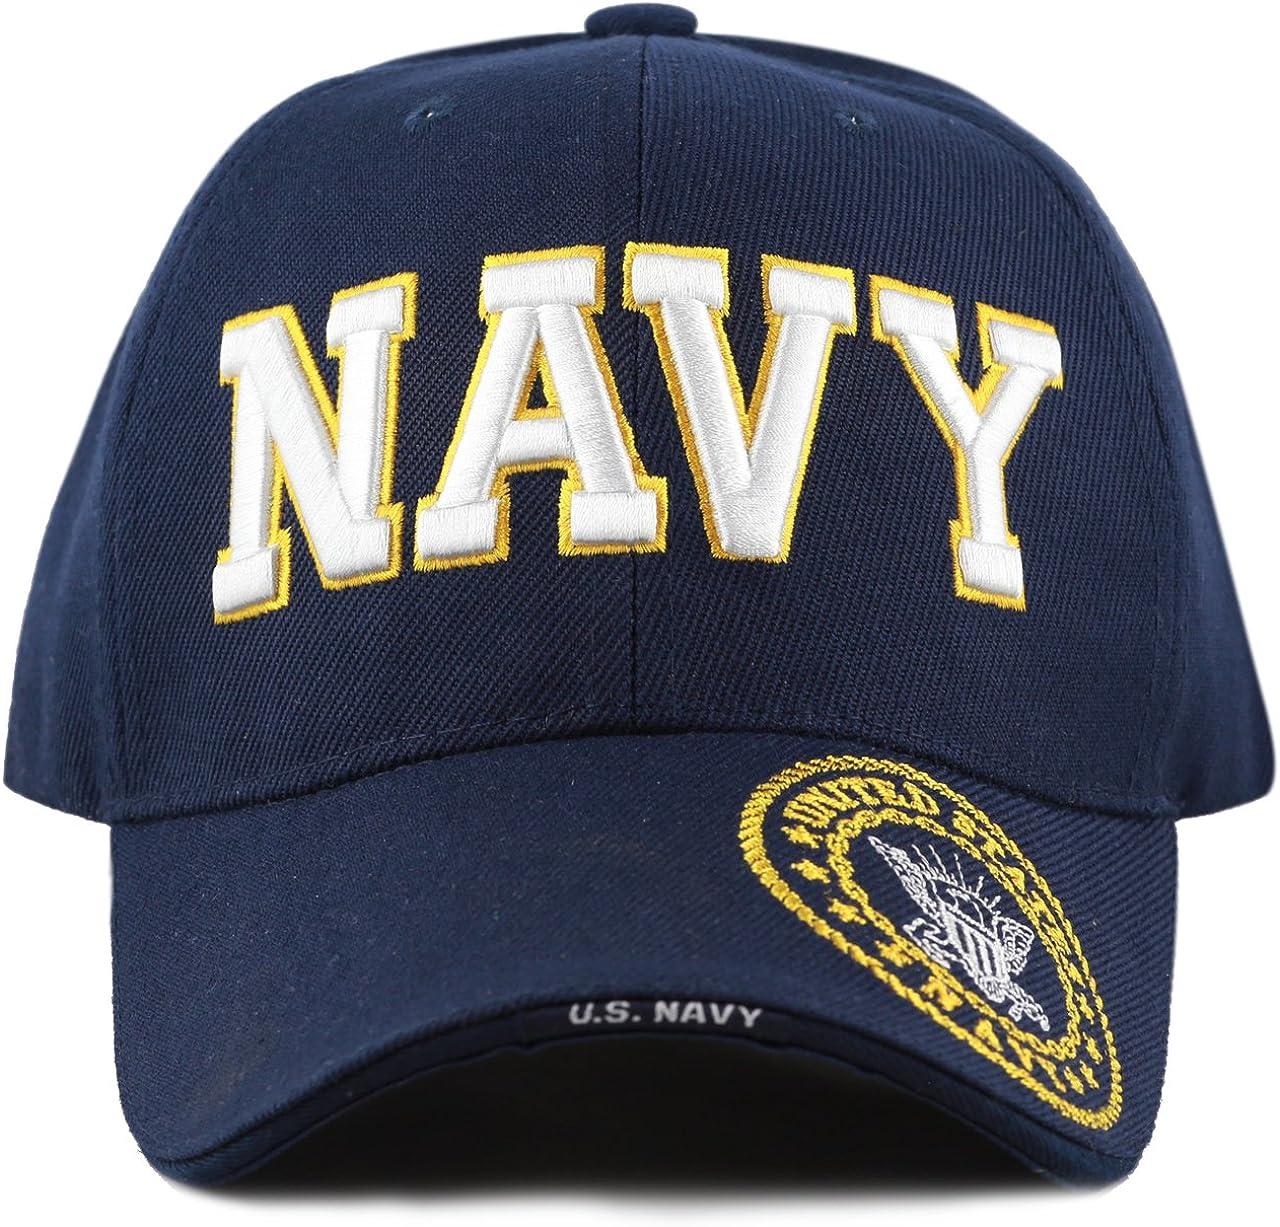 One Size Fits All US Navy Veteran Blue Baseball Cap NEW